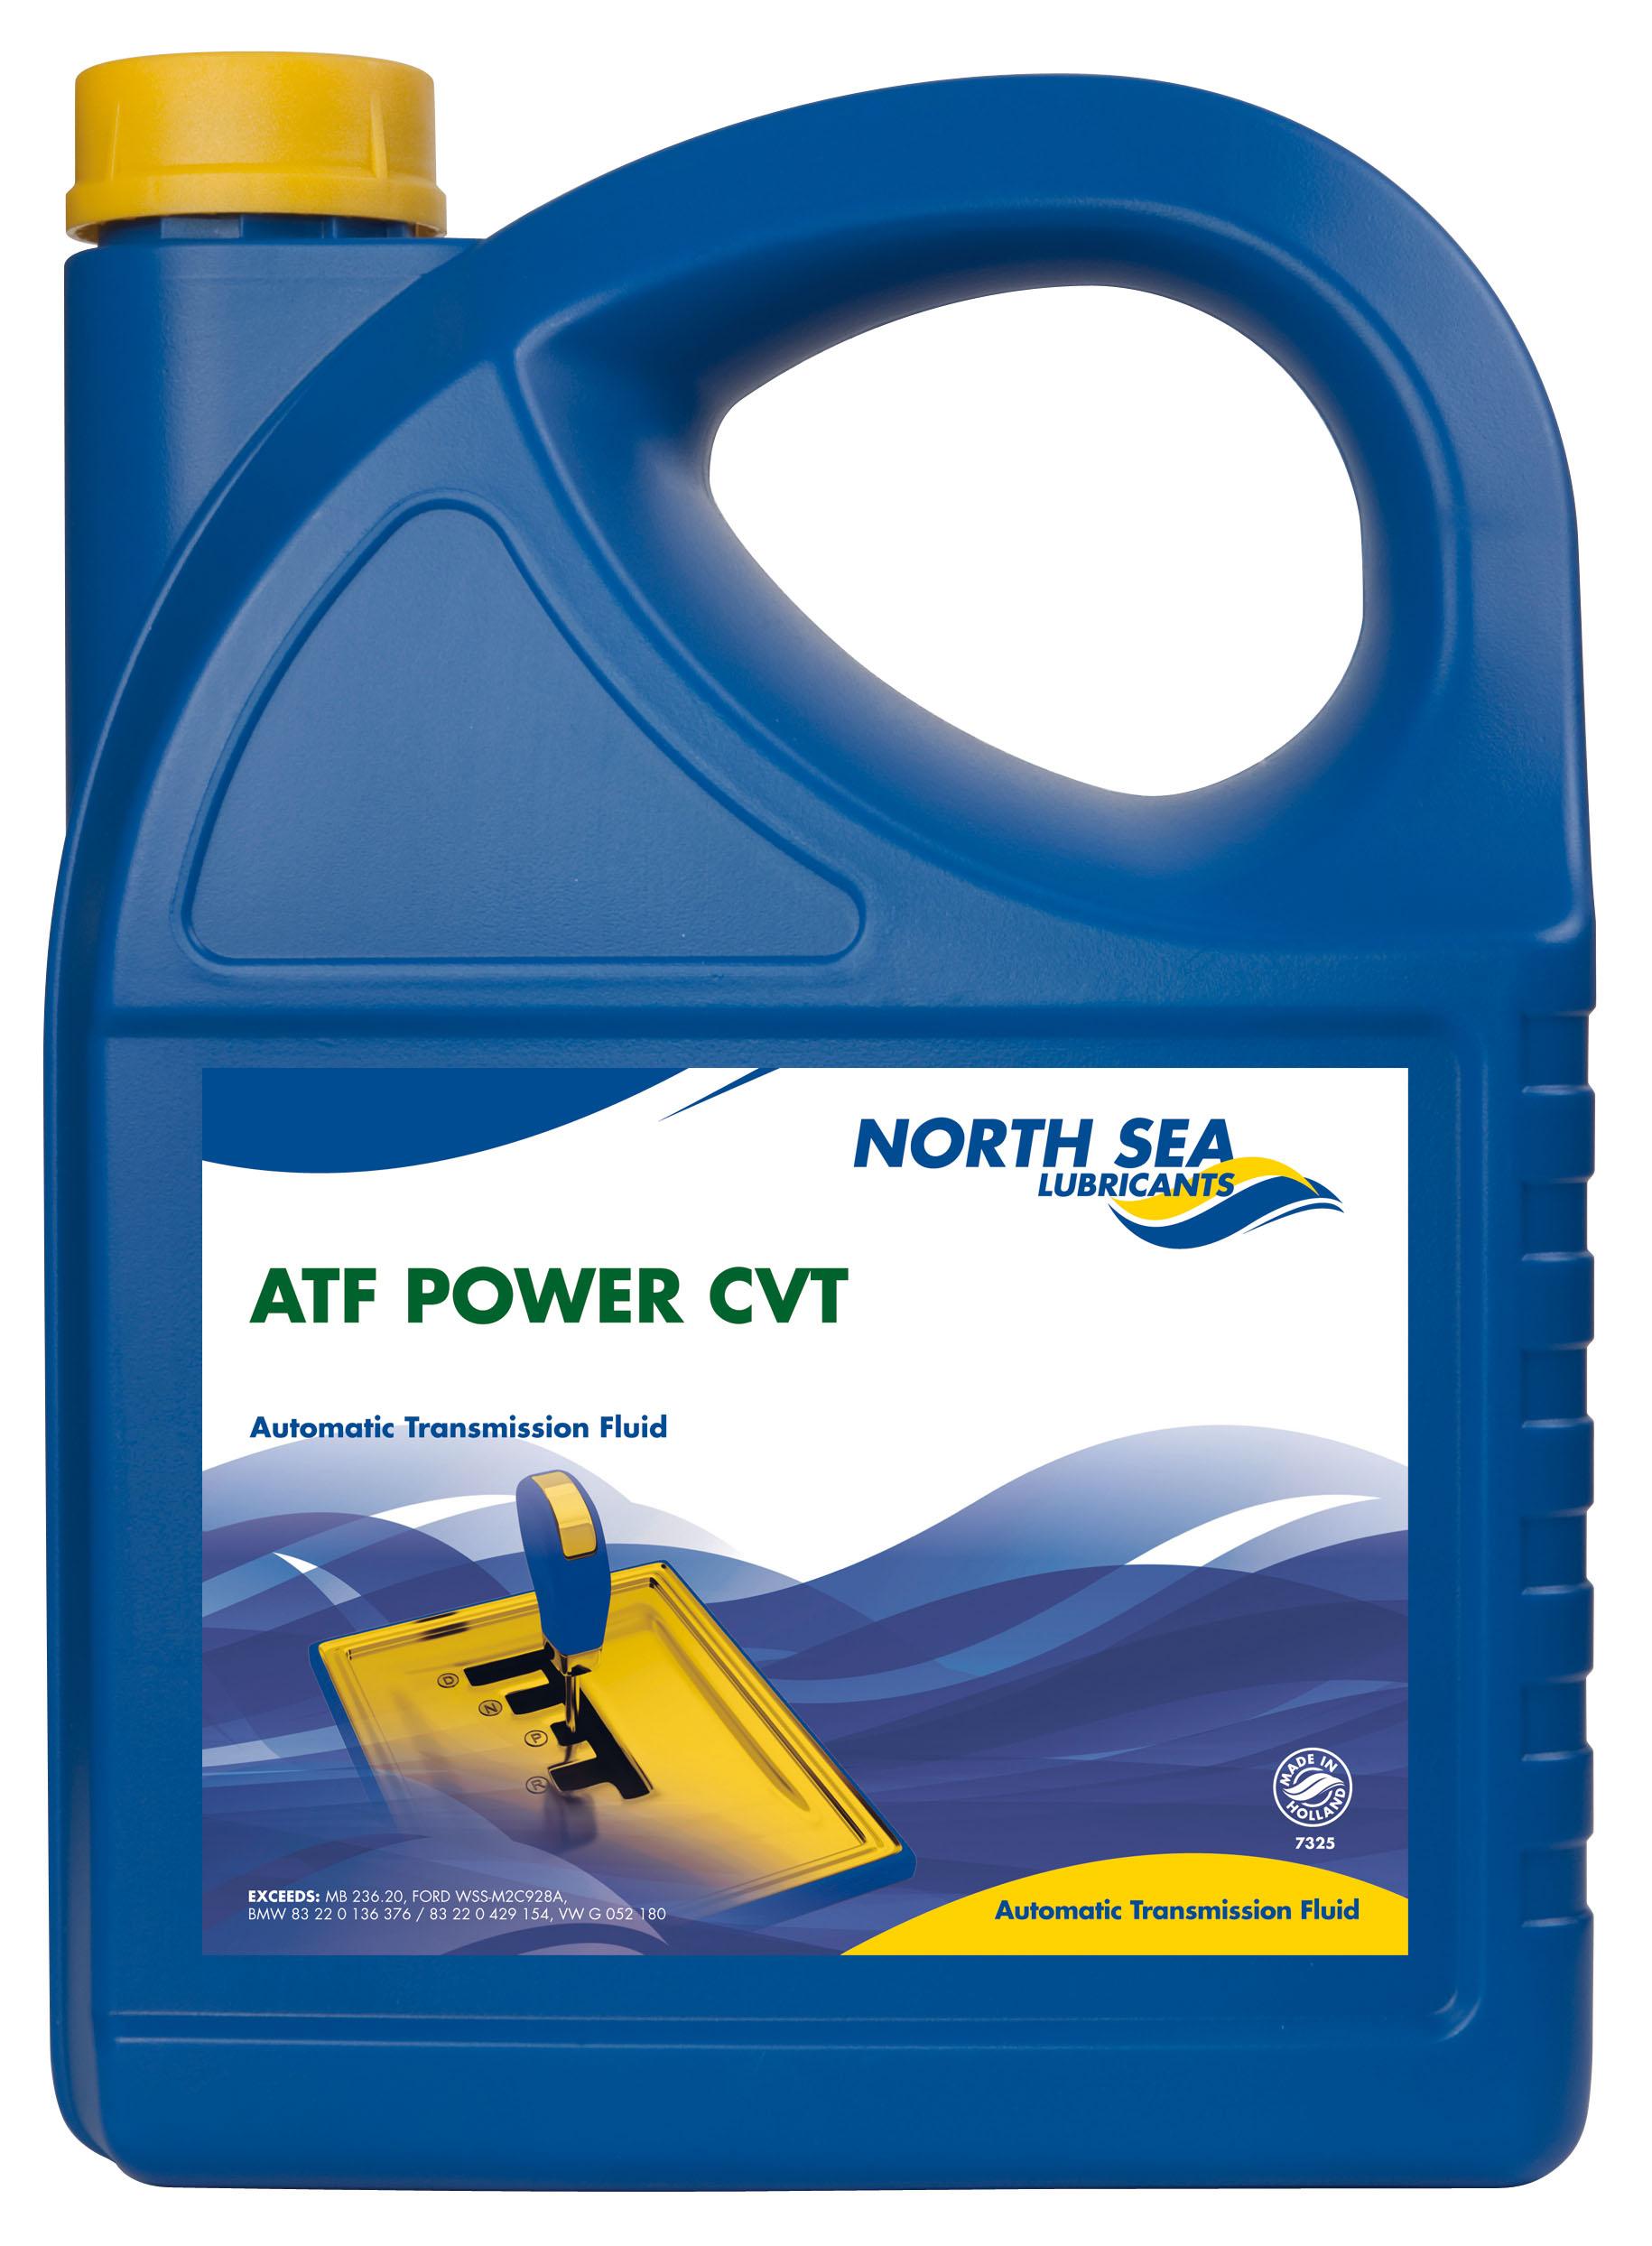 ATF POWER CVT | North Sea Lubricants